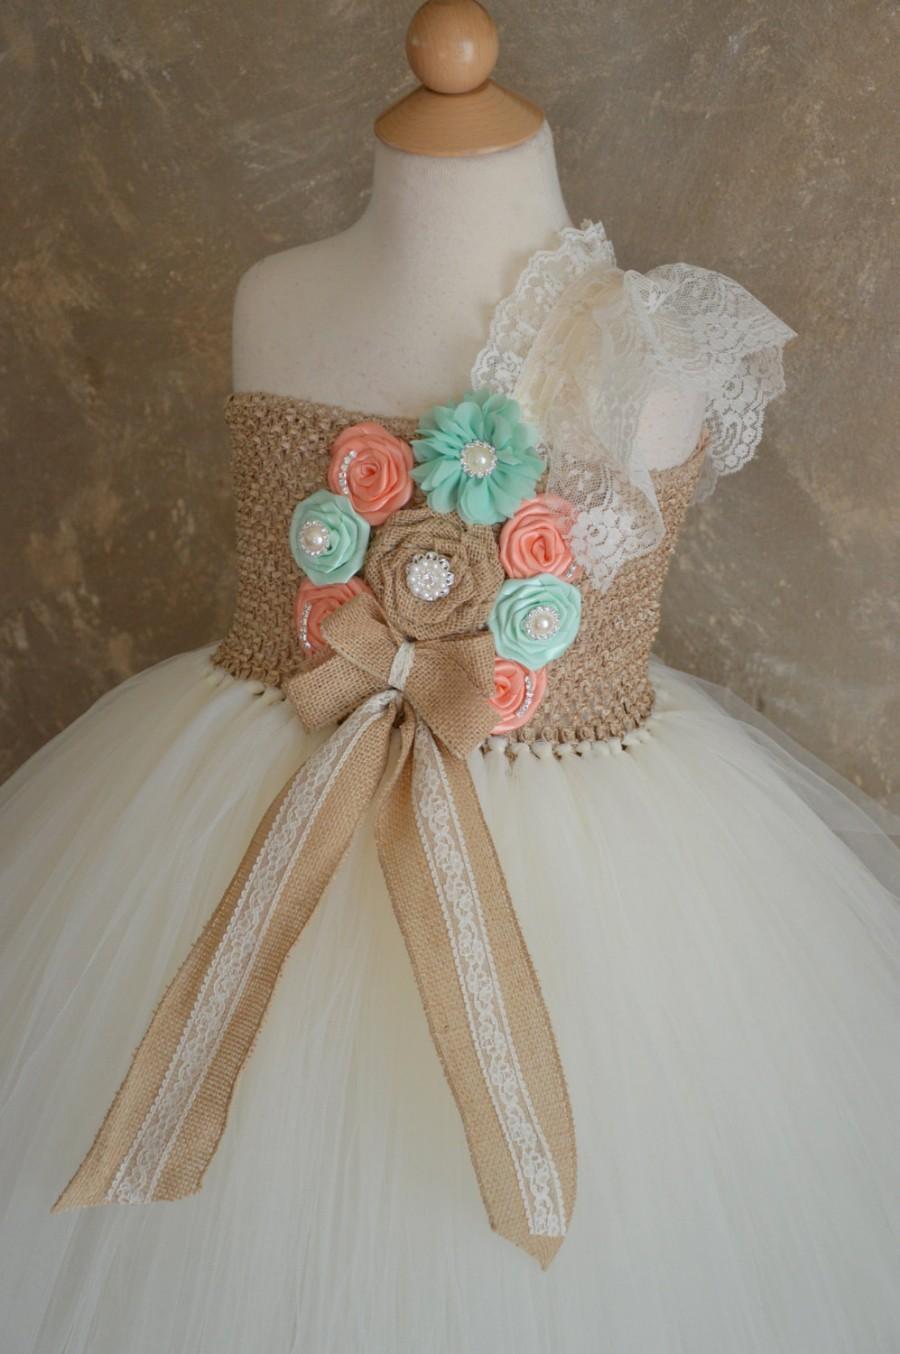 Wedding - Rustic Peach and mint flower girl tutu dress